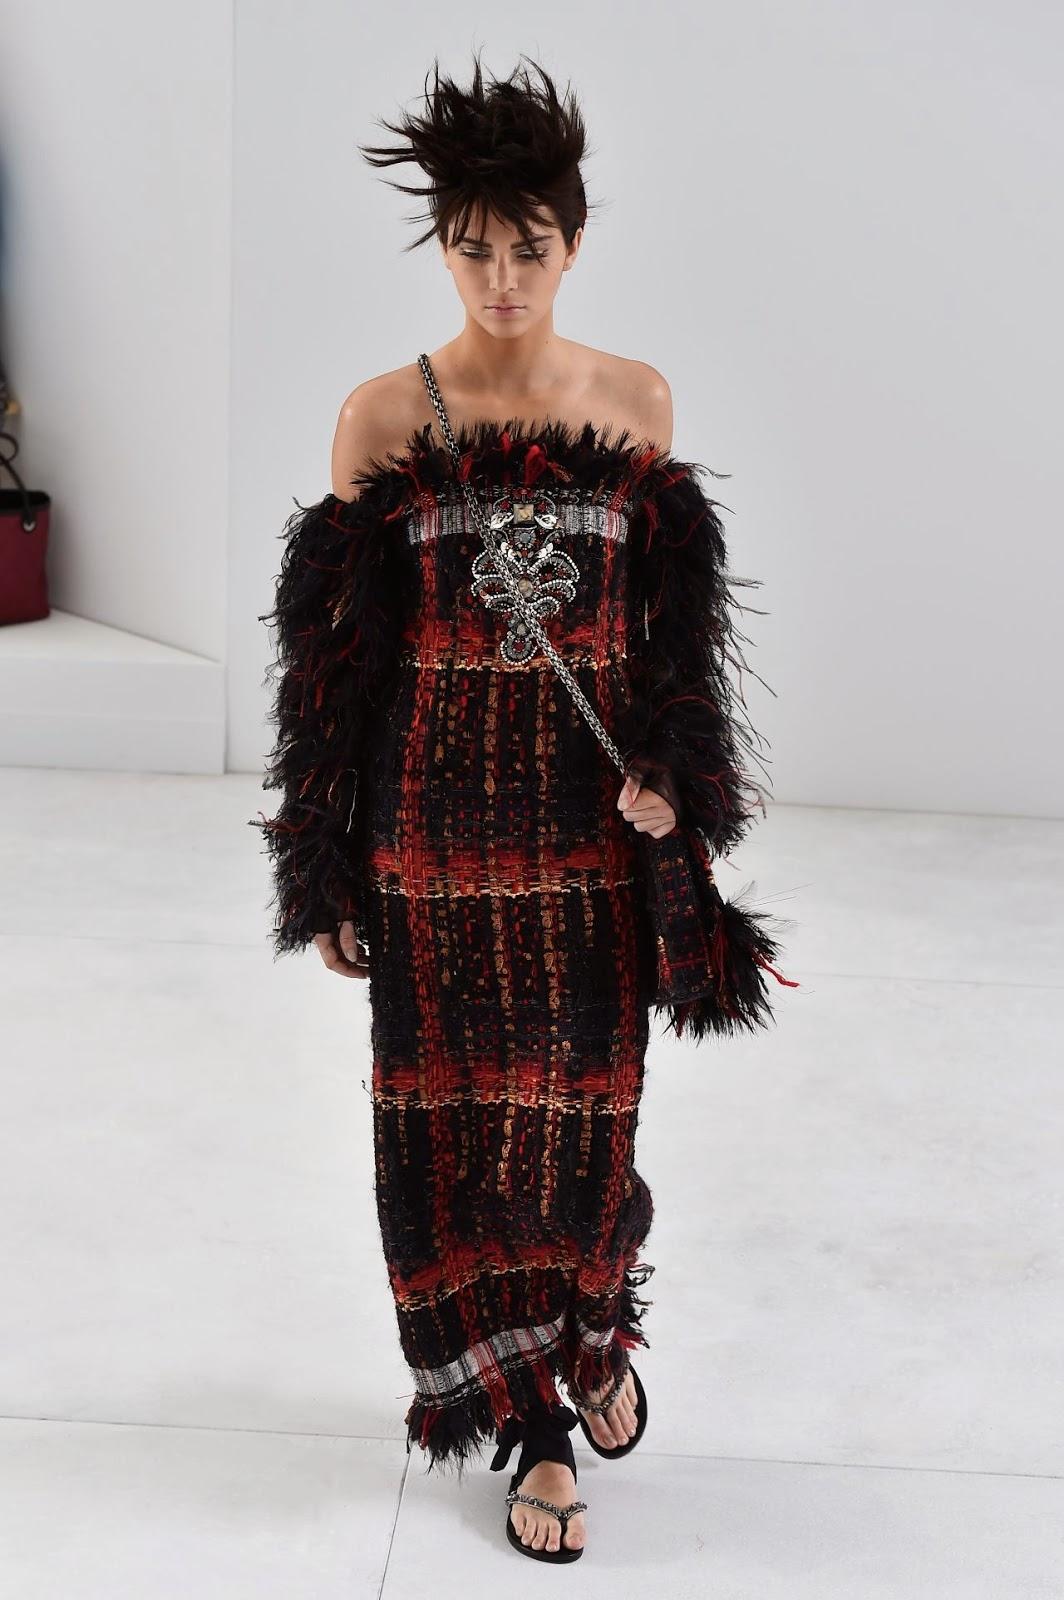 Kendall Jenner walks the Chanel - 211.1KB